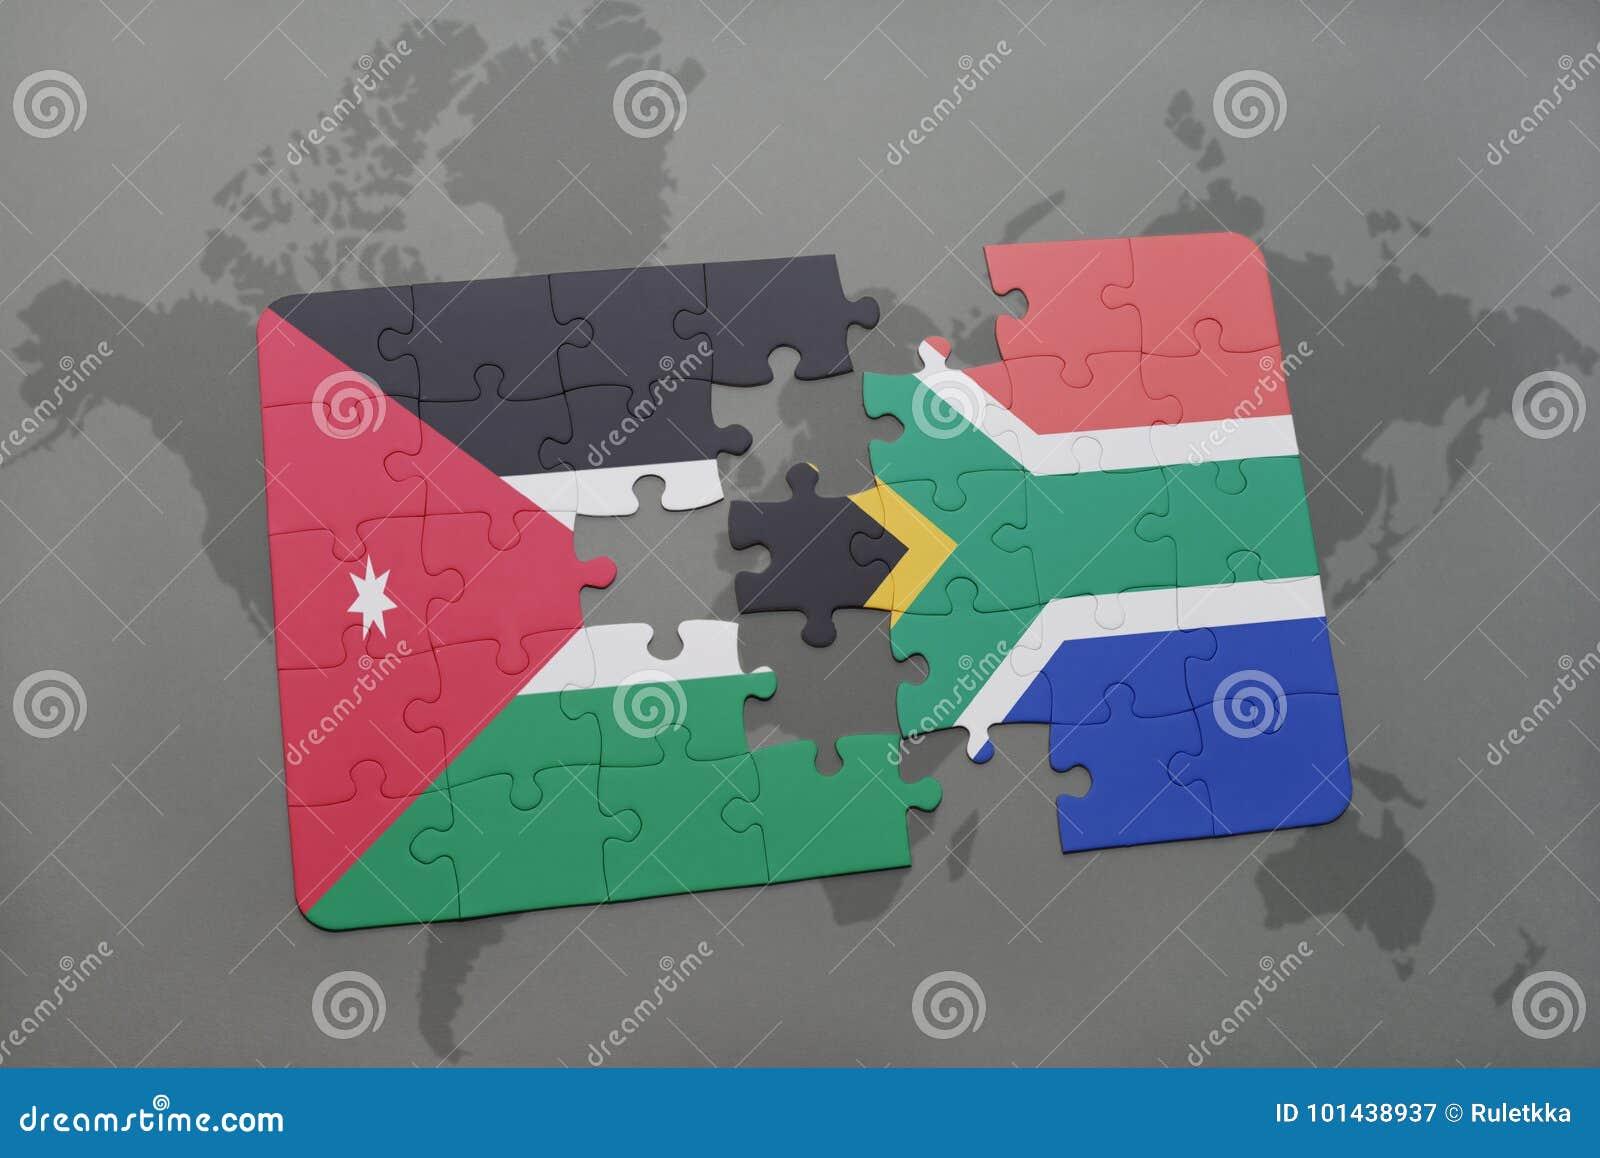 jordan south africa map